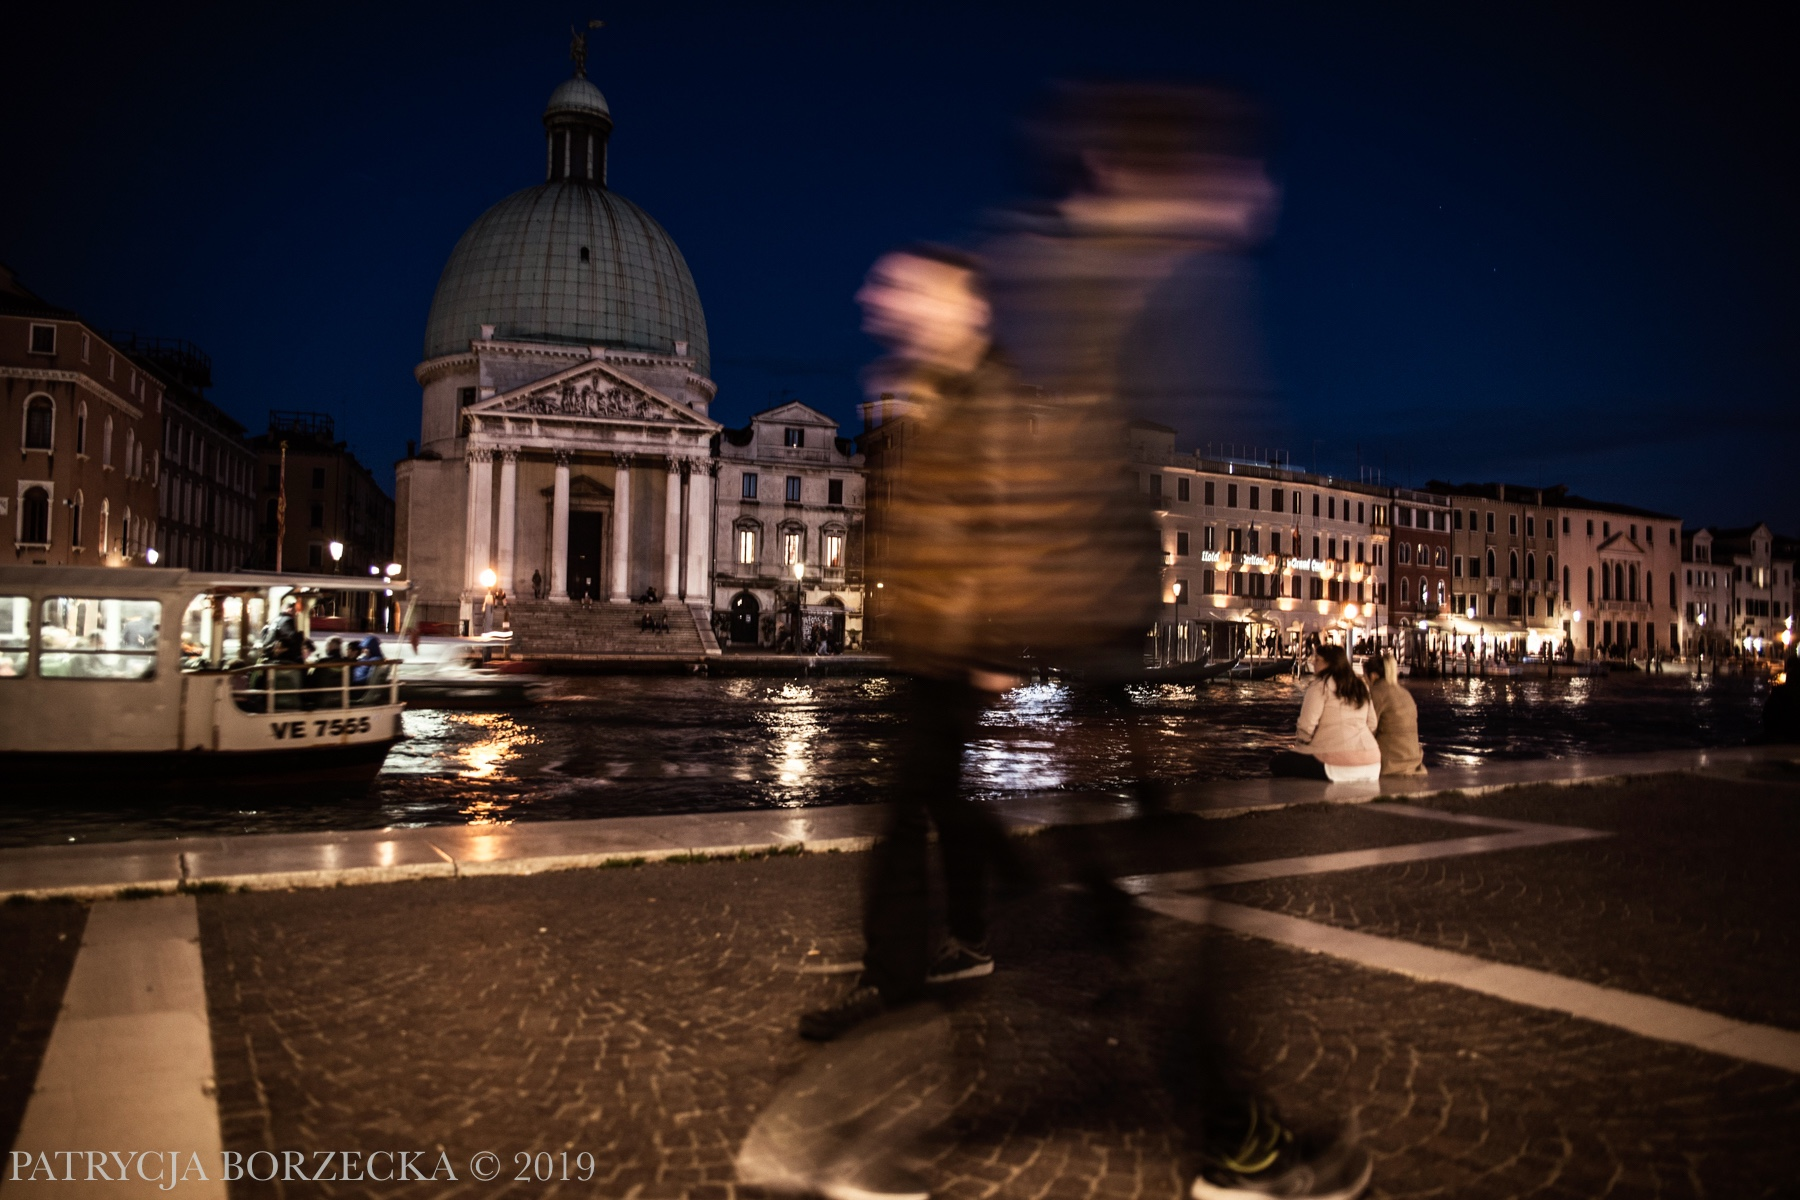 PatrycjaBorzecka-Photo-Venice-10